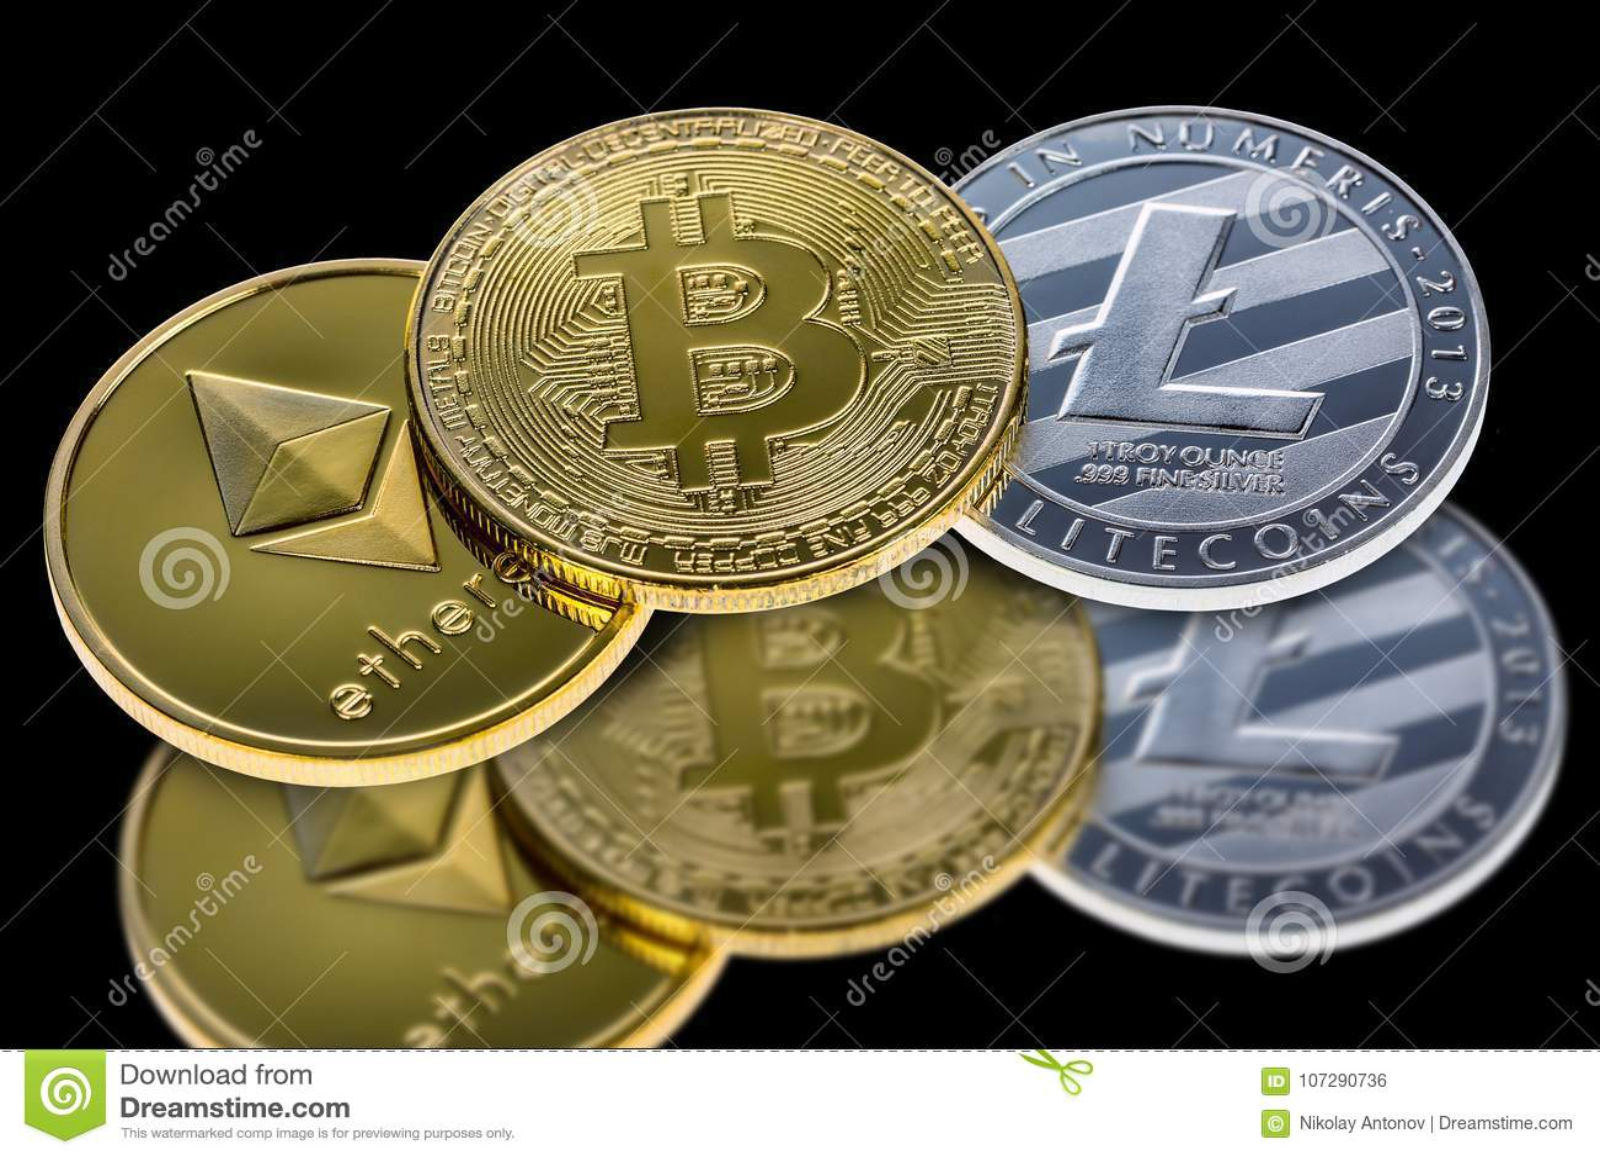 Монетки биткоин форекс пипс это